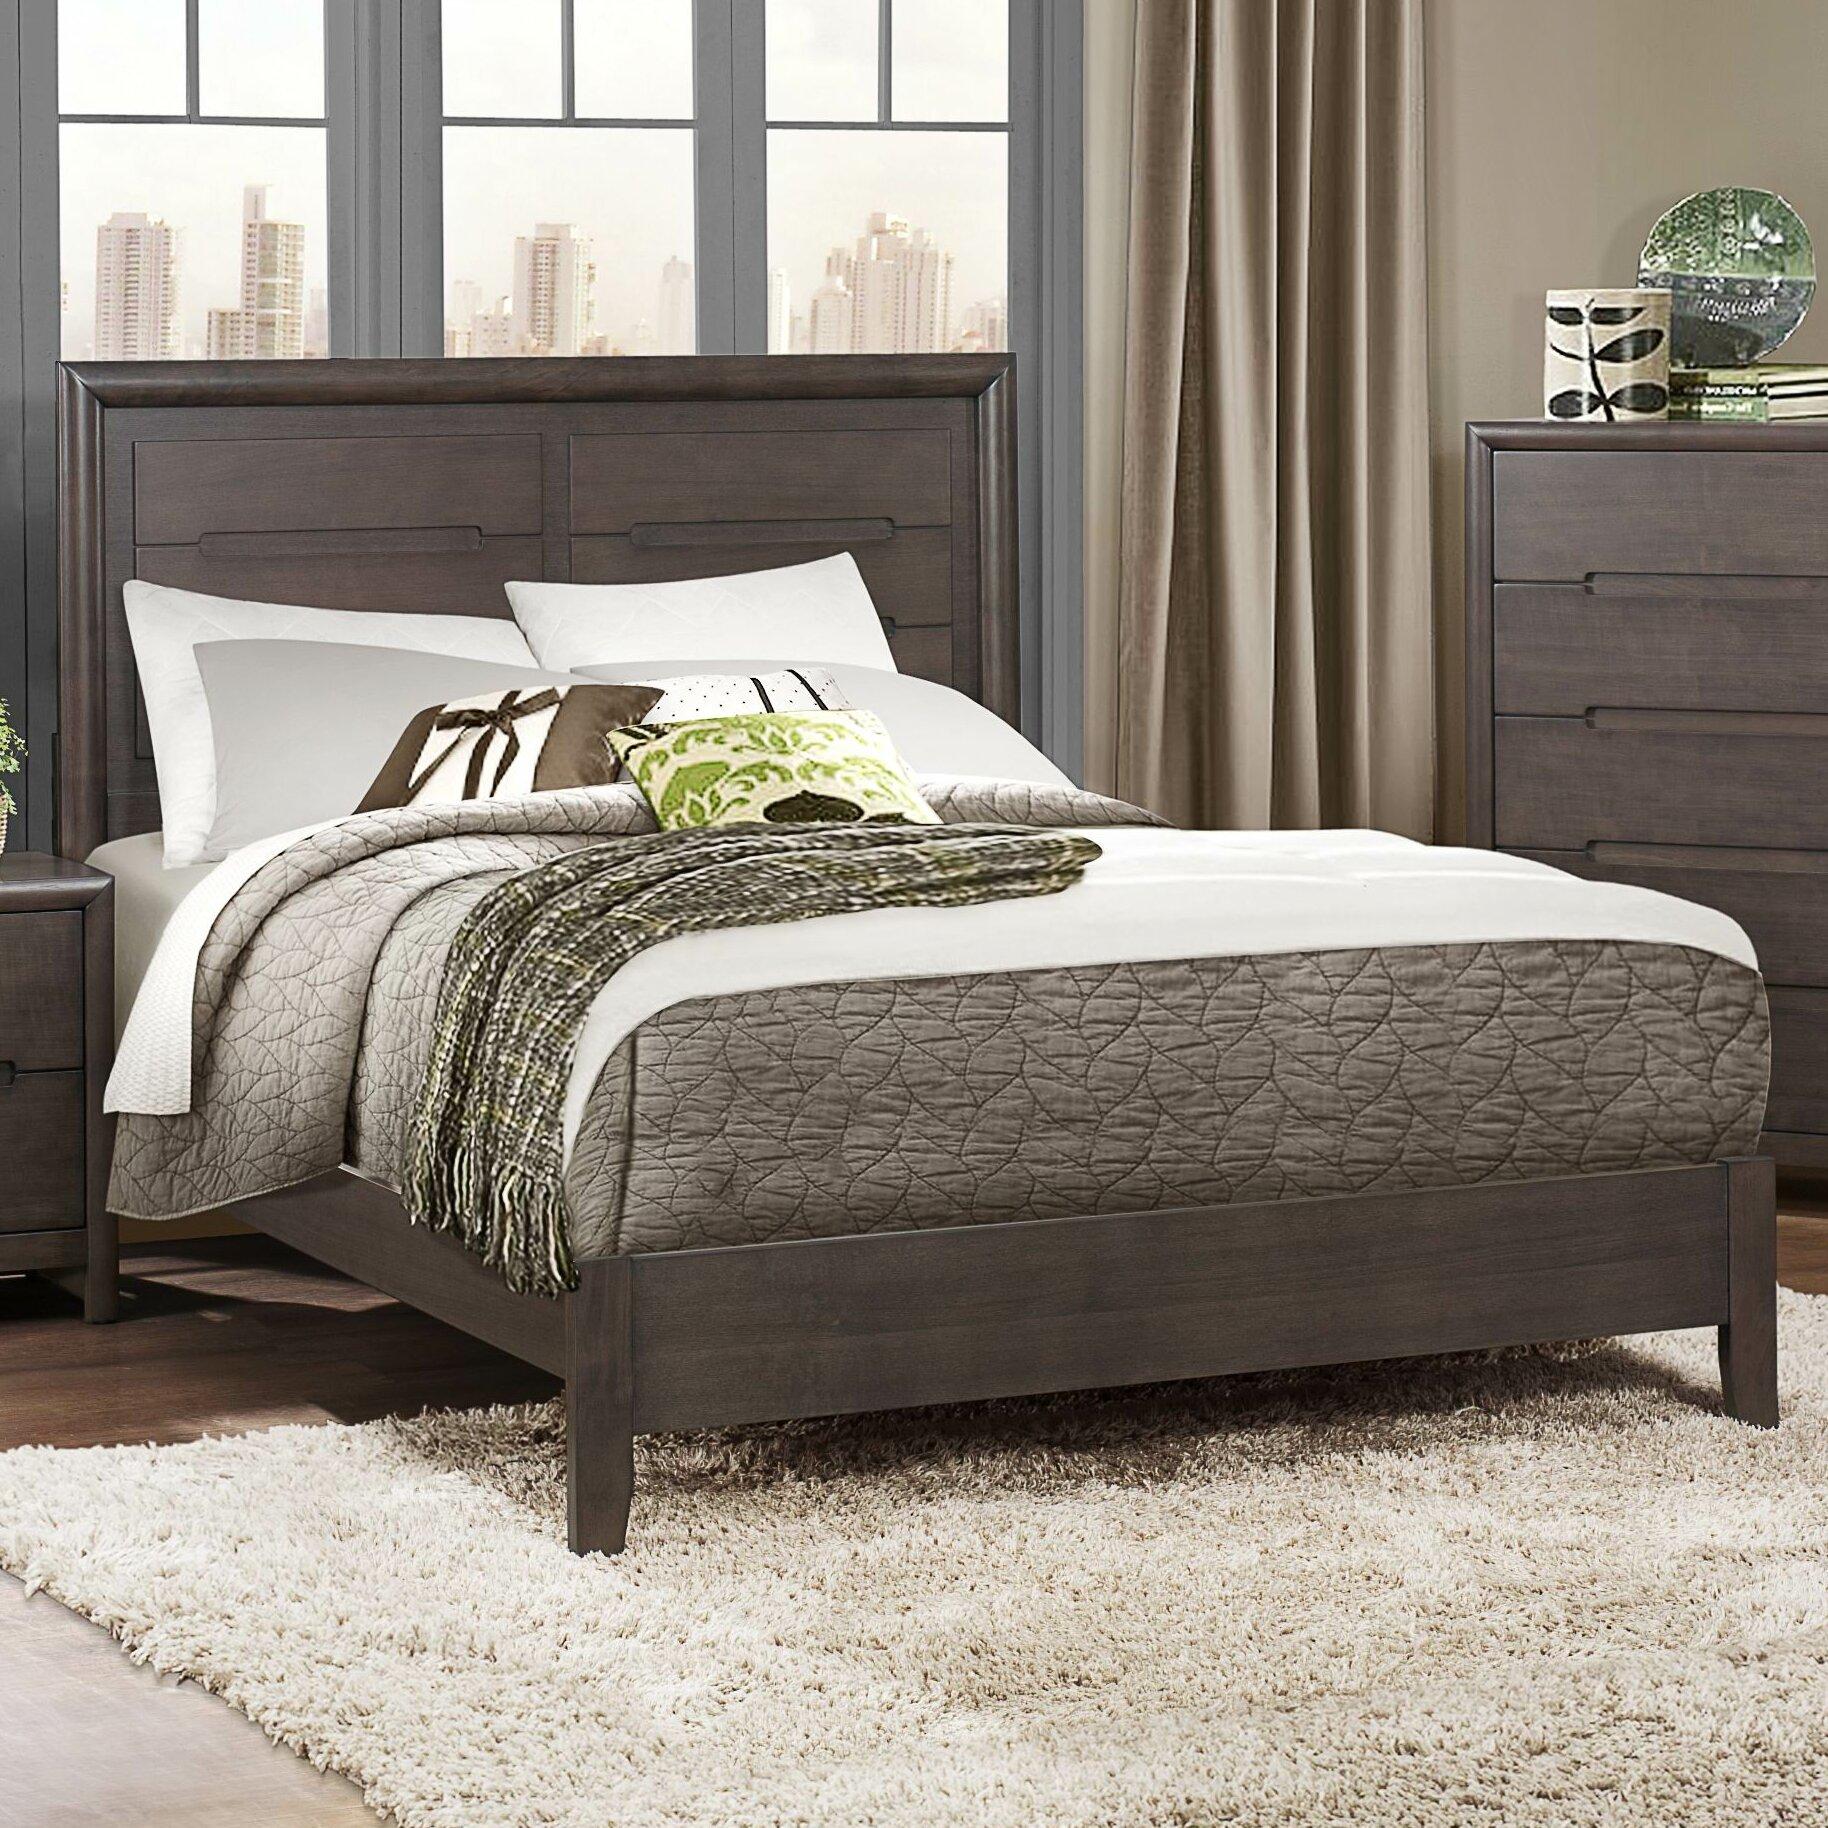 Woodhaven Hill Lavinia Queen Panel Customizable Bedroom